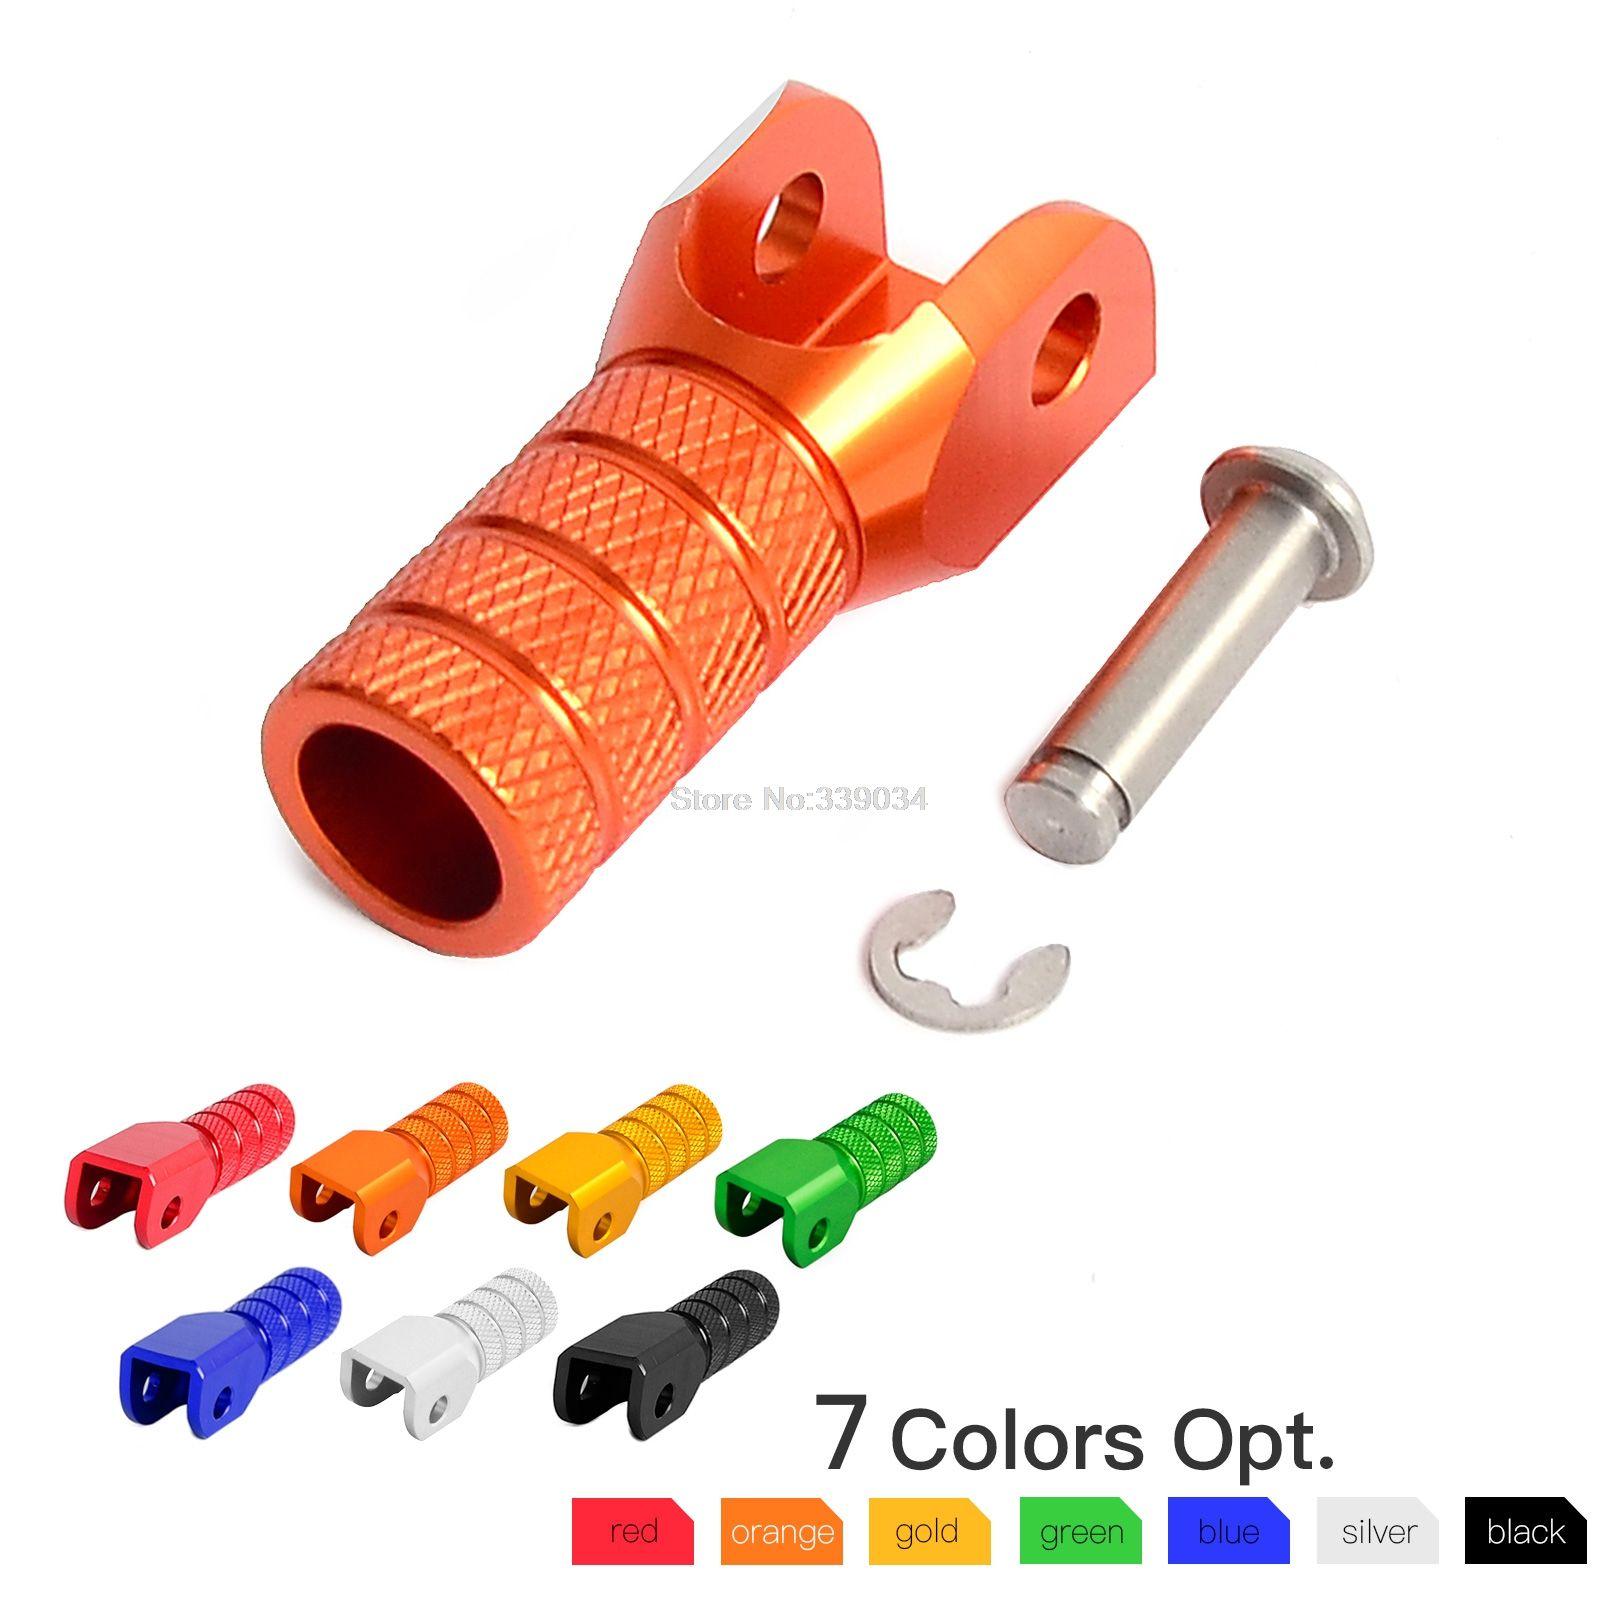 NICECNC Billet Gear Shifter Shift Lever Tip Replacement For KTM SX SXF EXC EXCF XCW XCF SMR SMC Suzuki RM80 RM85 RM 125 250 RMZ